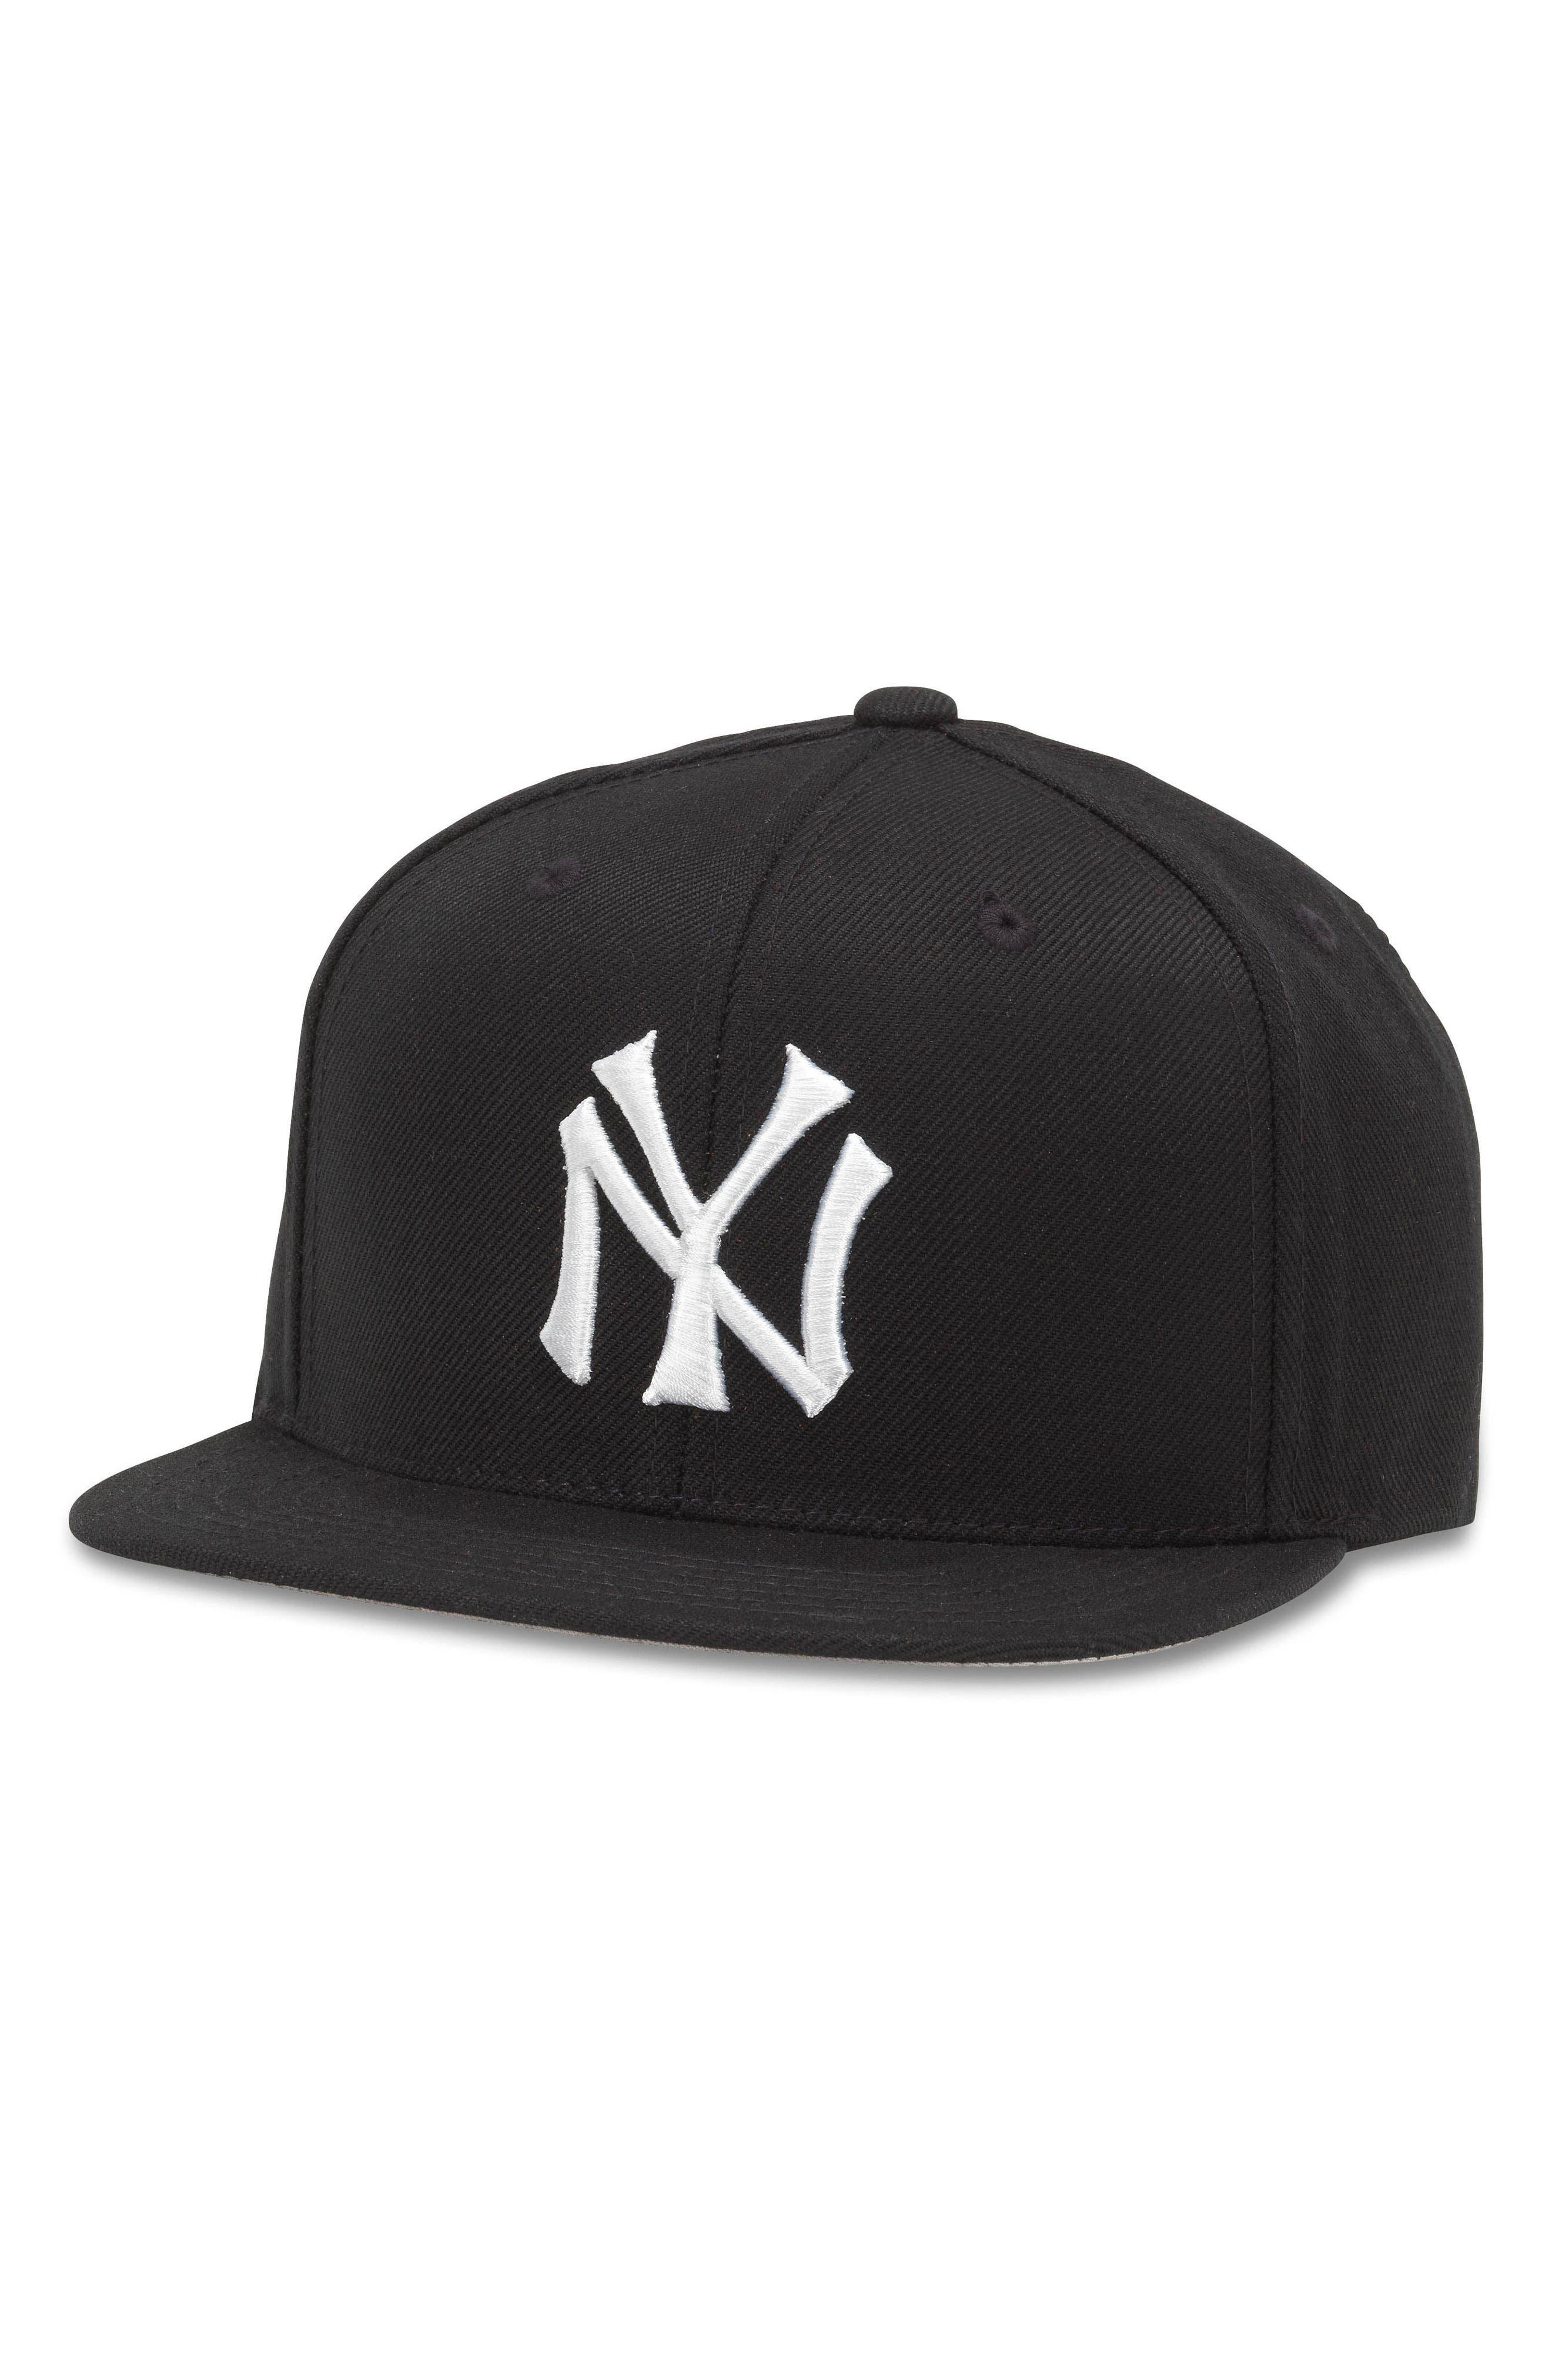 American Needle Sideline MLB Baseball Cap